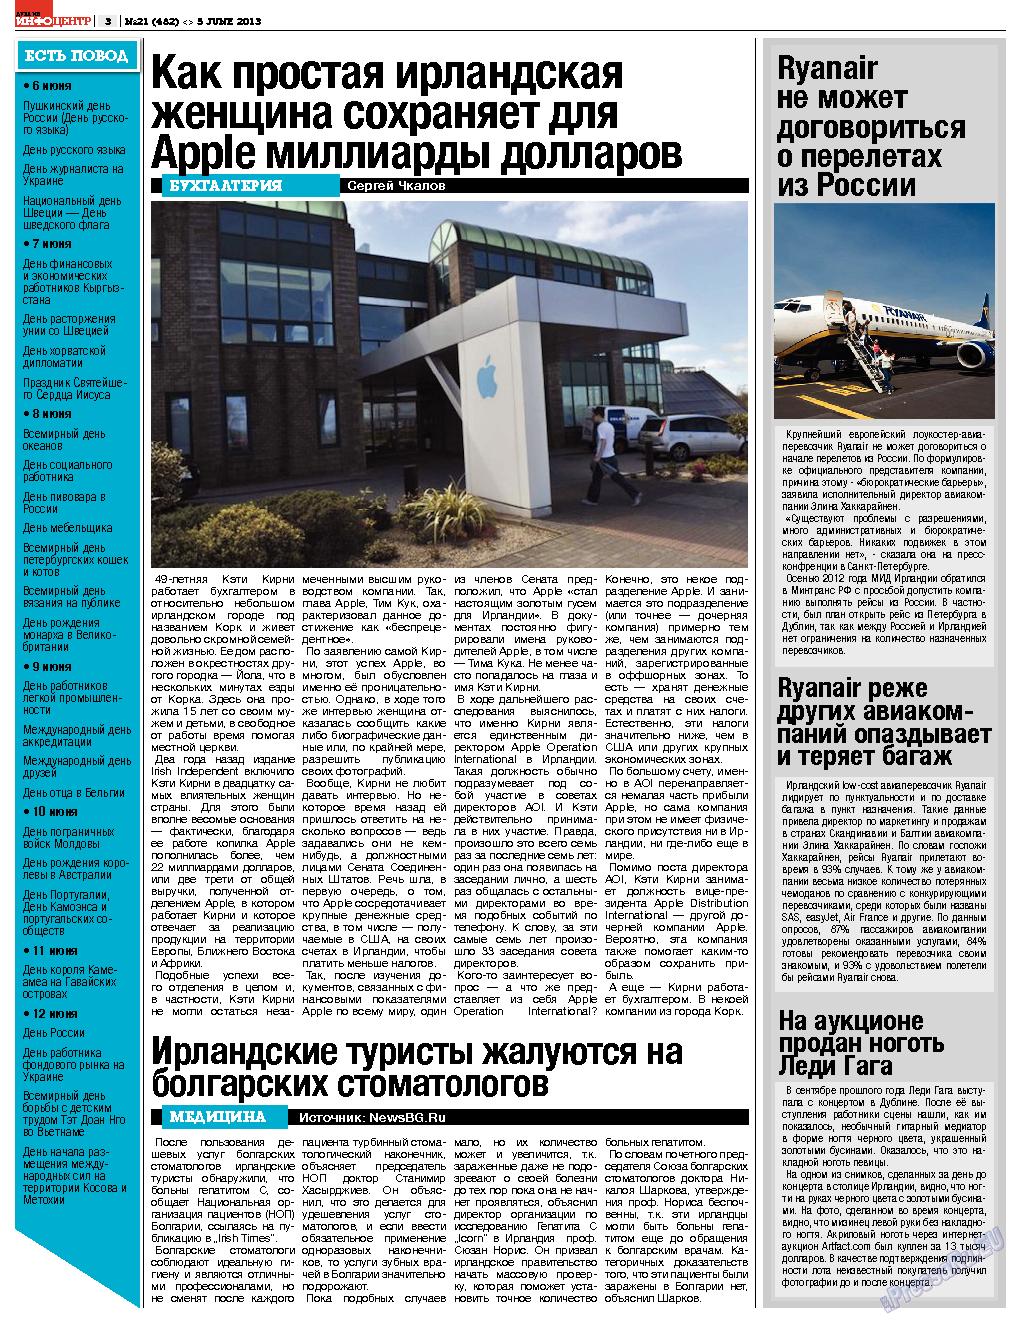 Дублин инфоцентр (газета). 2013 год, номер 21, стр. 3